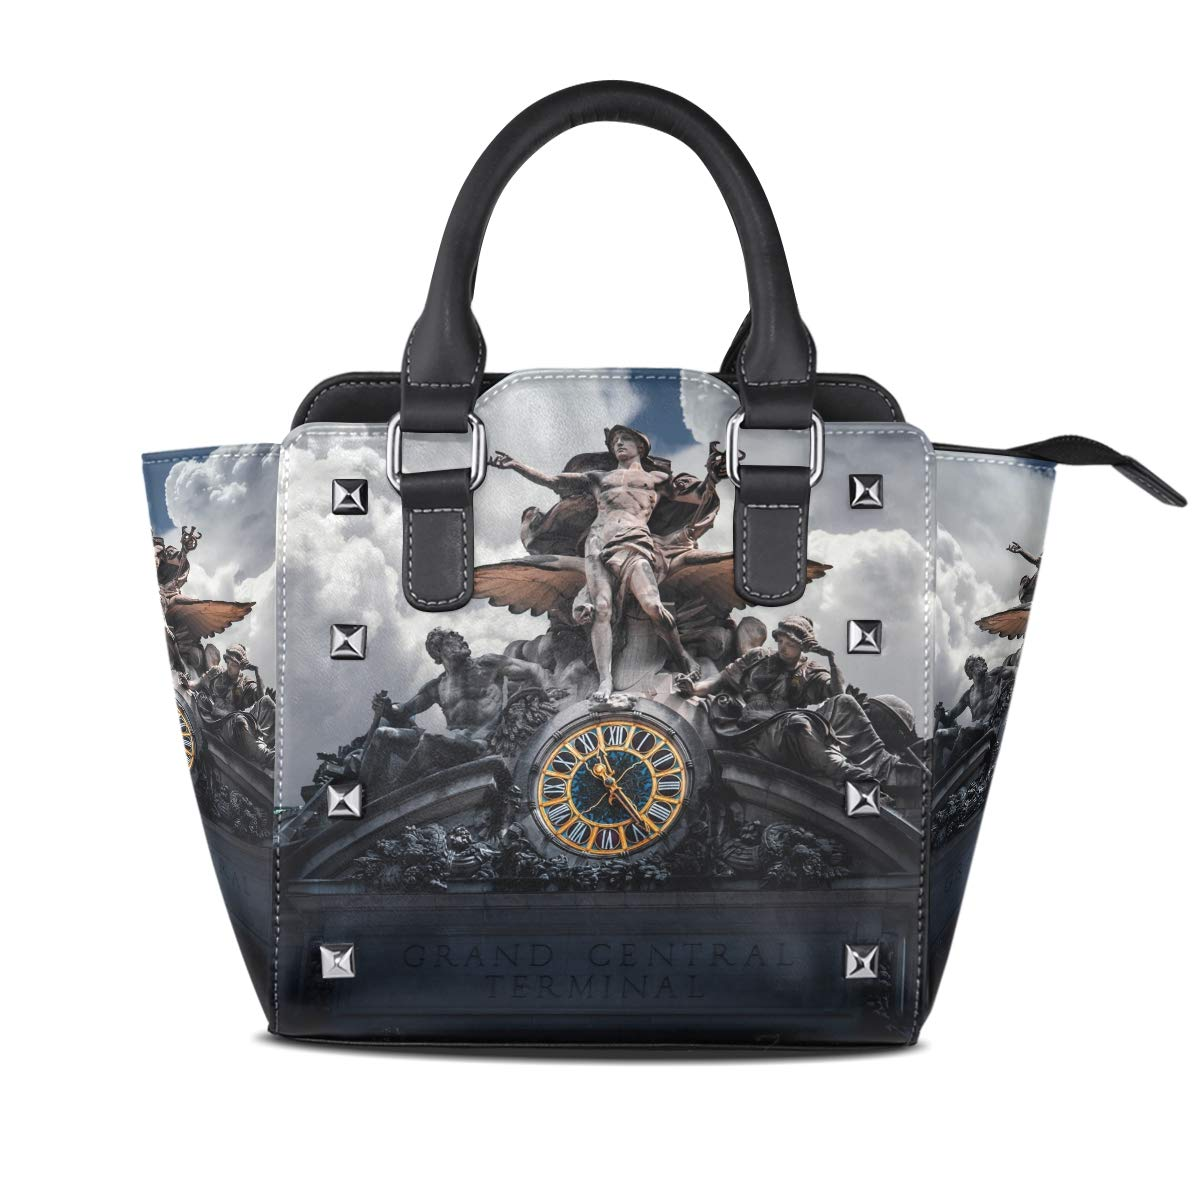 Design 3 Handbag Brown Brick Wall With Woman Painting Genuine Leather Tote Rivet Bag Shoulder Strap Top Handle Women